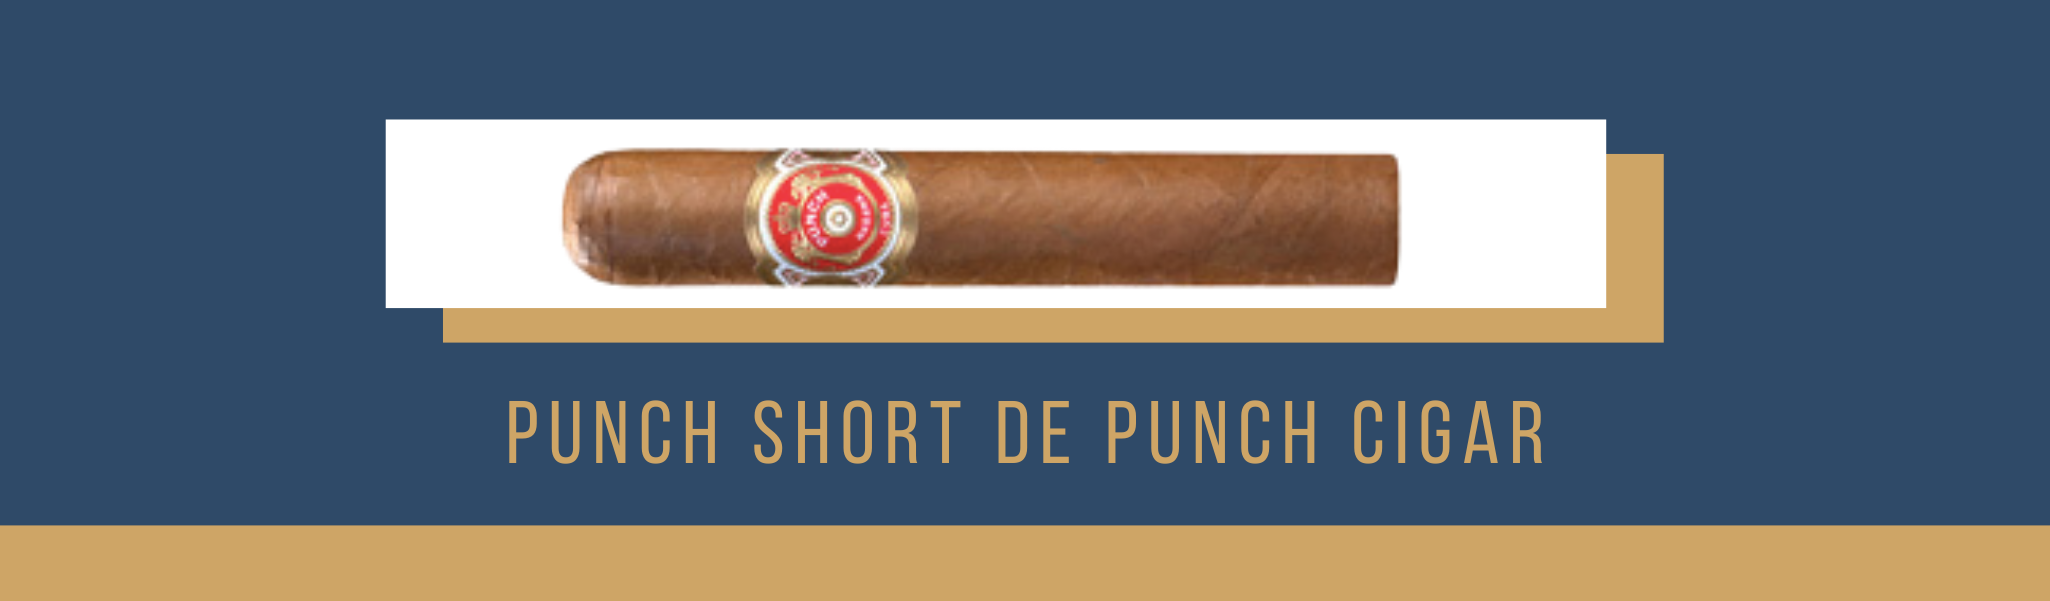 Buy the Punch Short de Punch cigar now